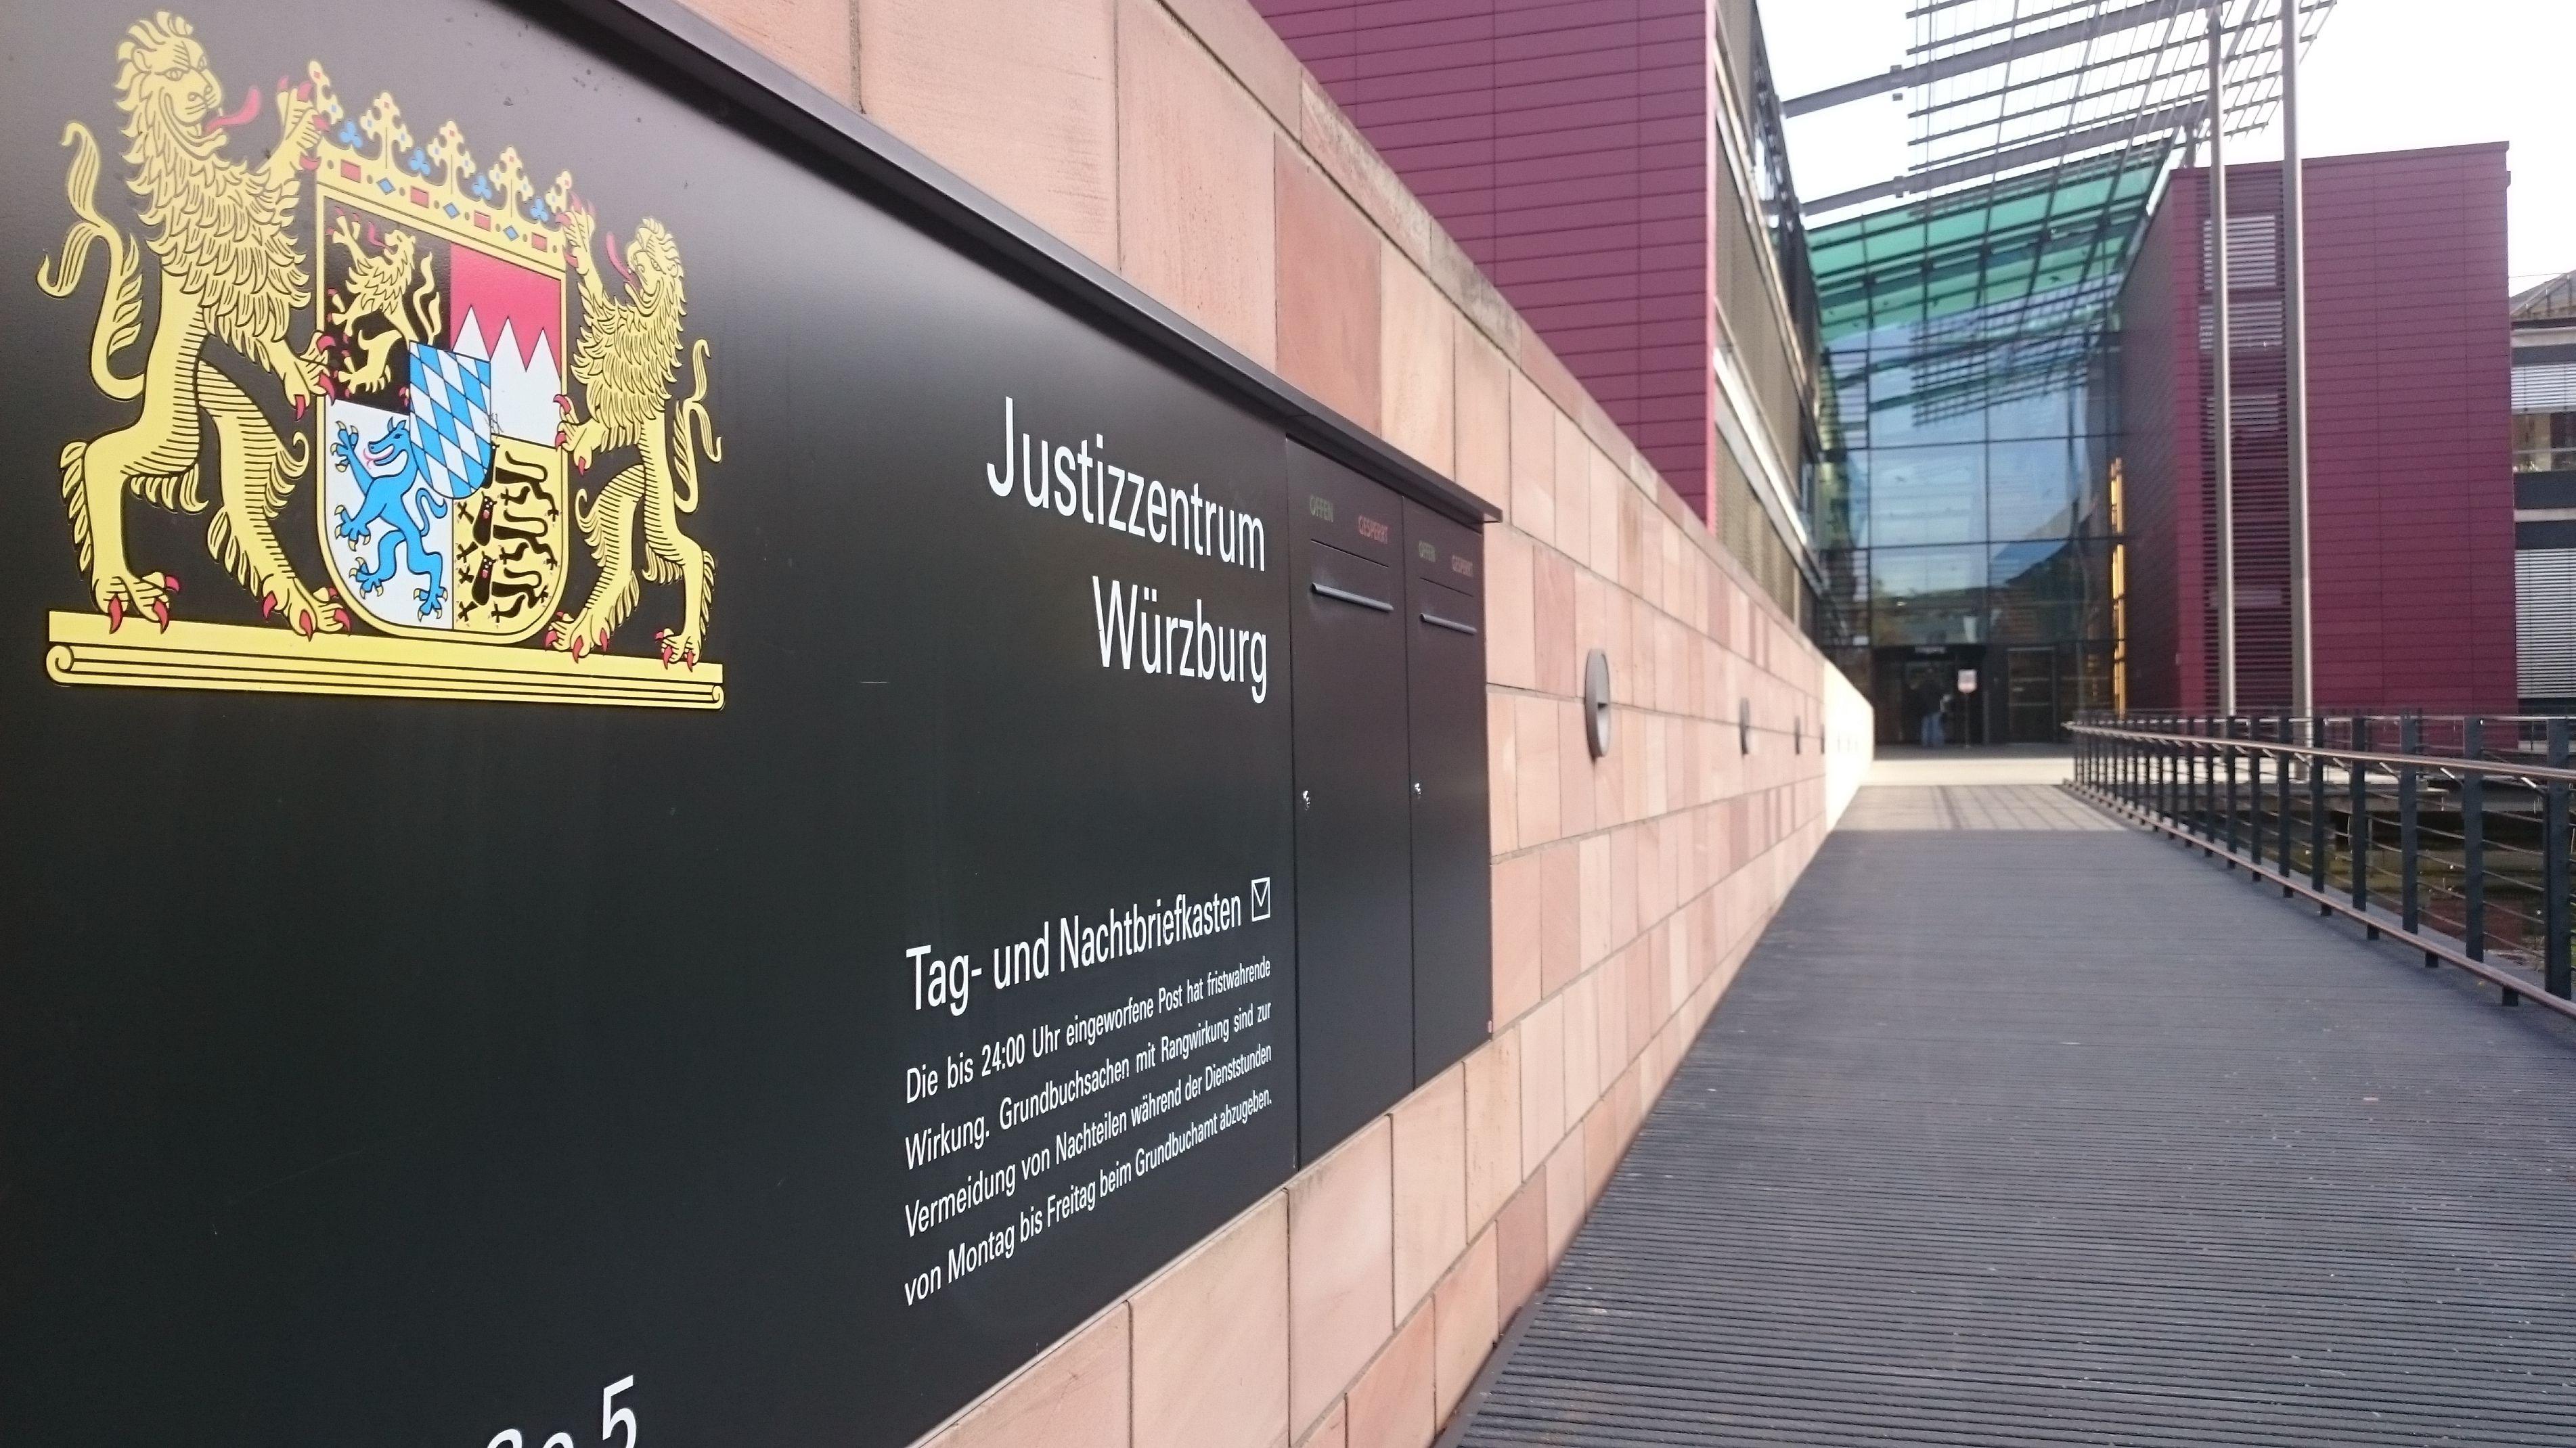 Würzburger Strafjustizzentrum